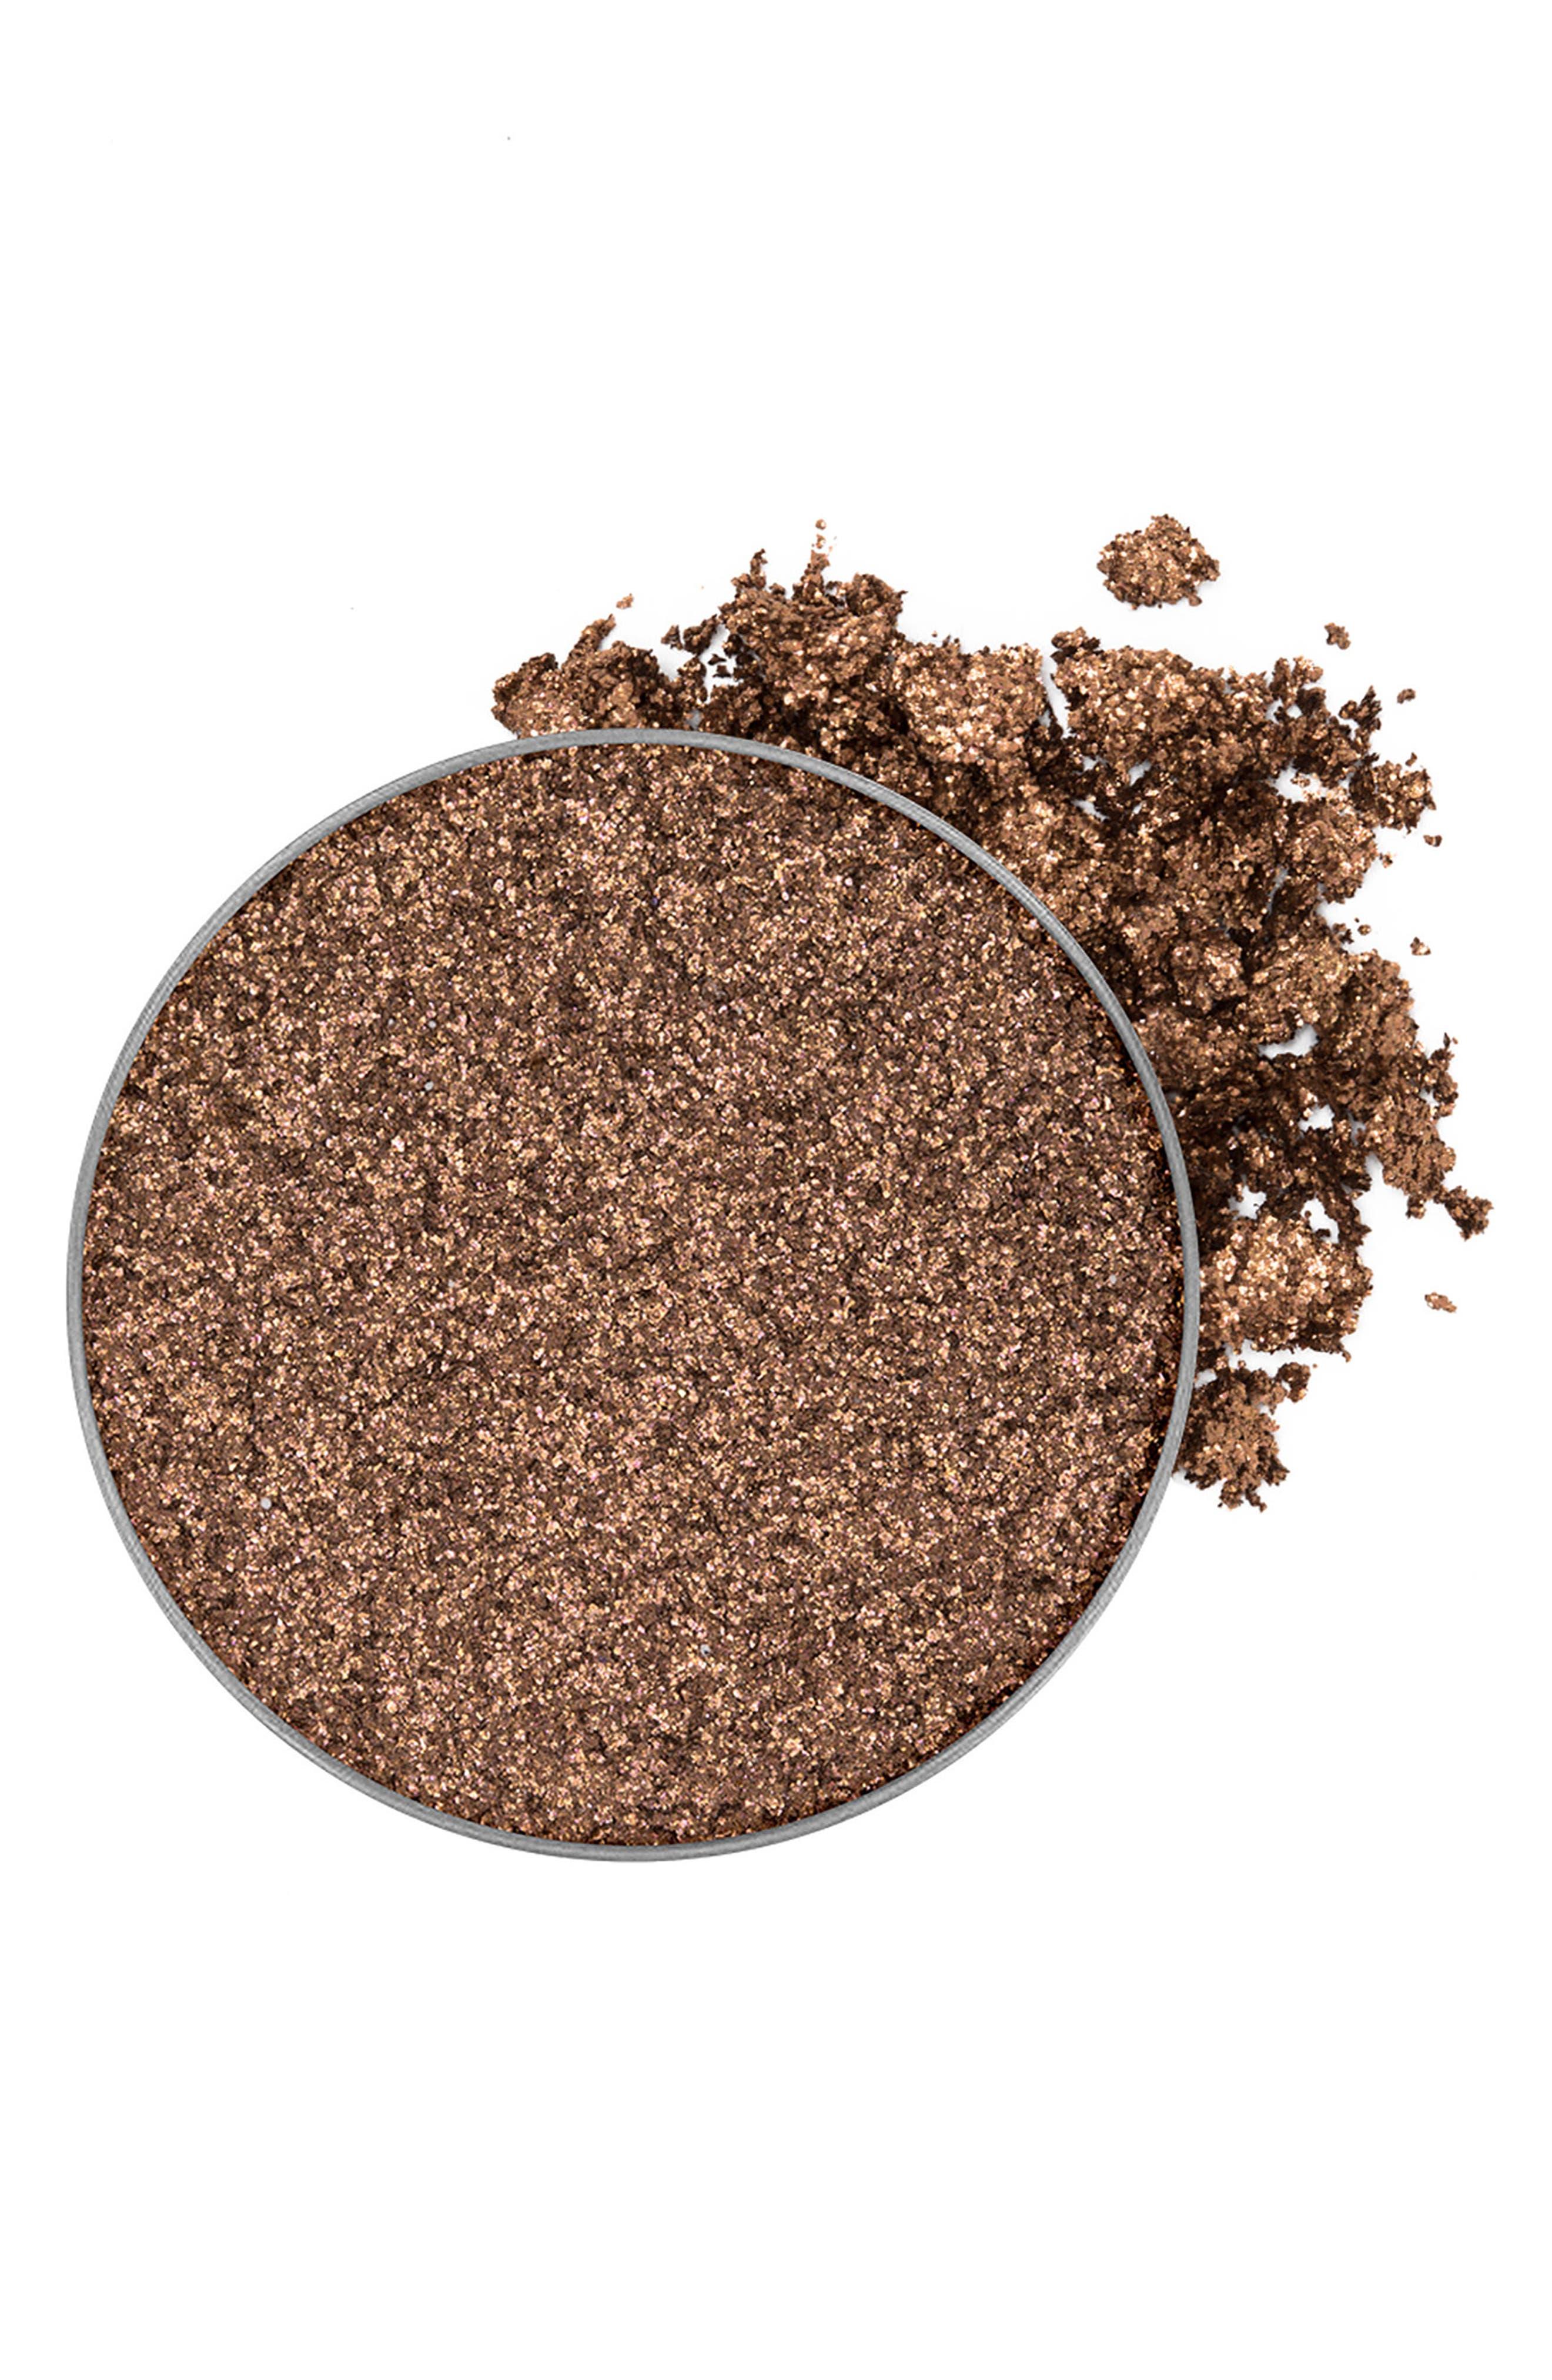 ANASTASIA BEVERLY HILLS Eye Shadow Singles Golden Copper 0.059 Oz/ 1.67 G